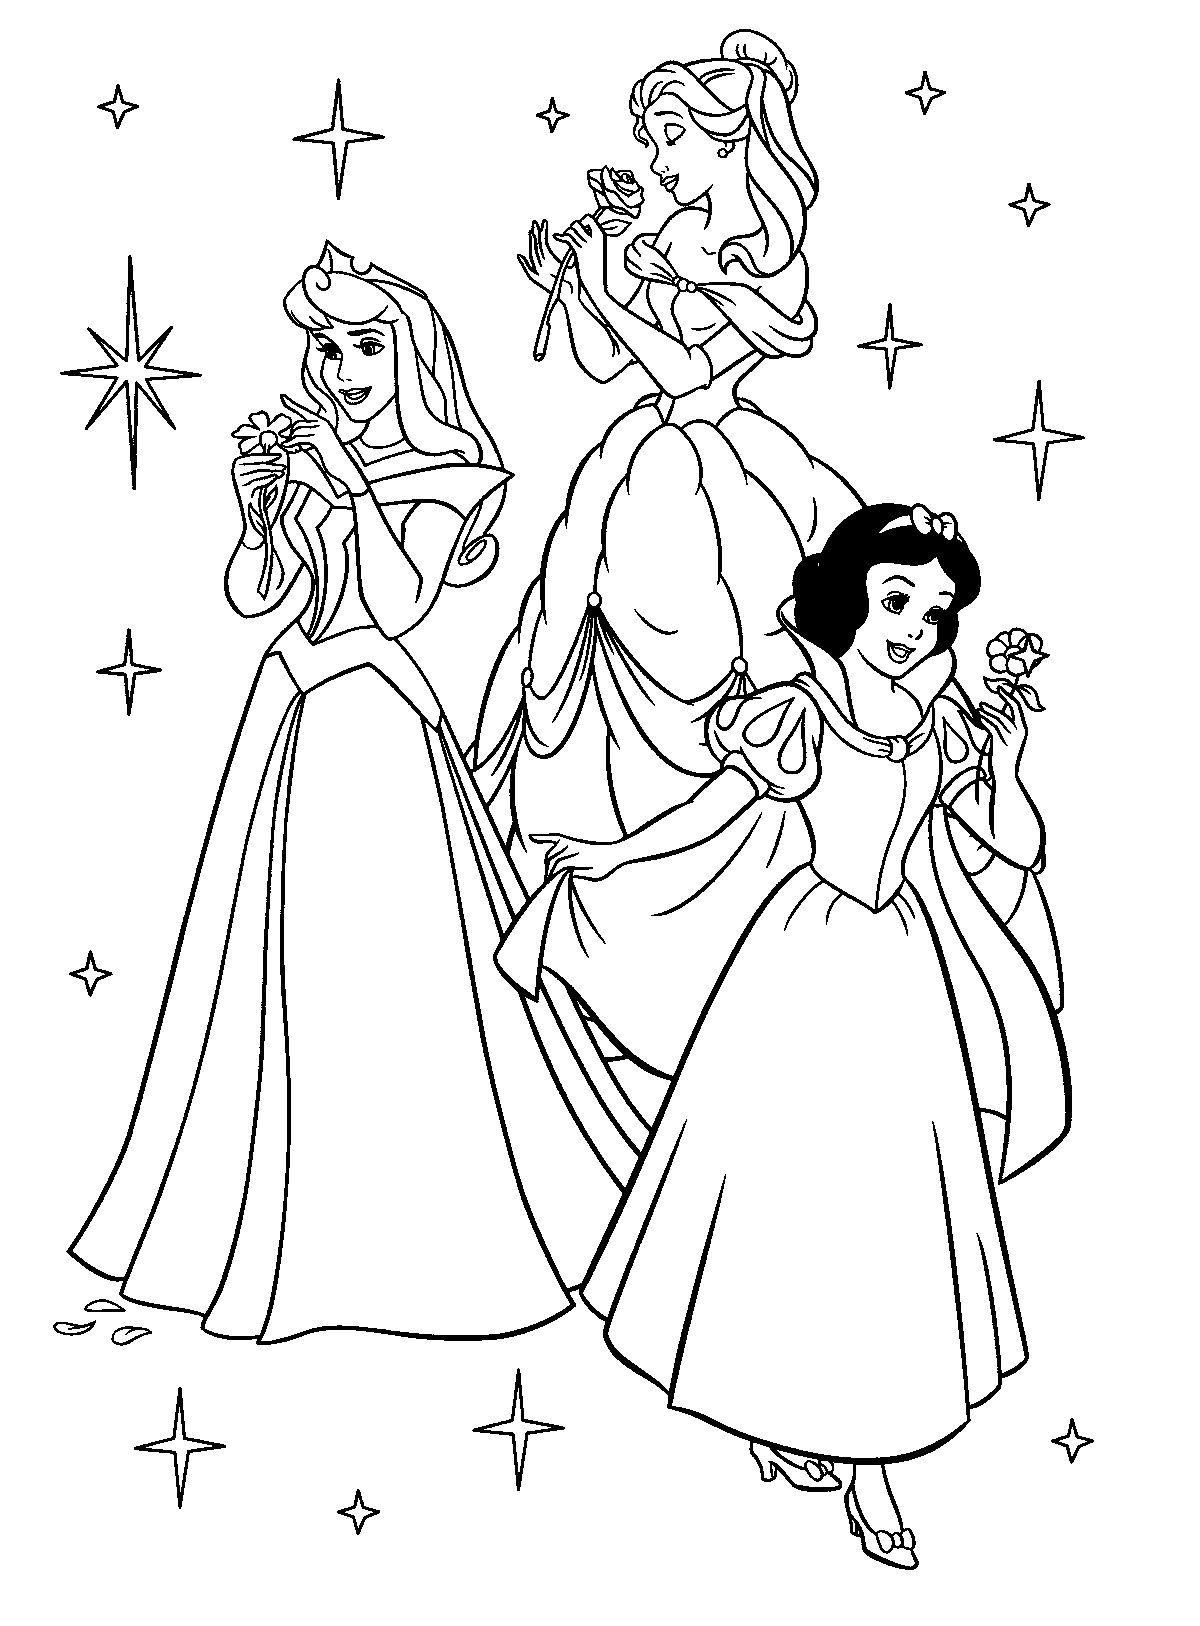 Free Printable Disney Princess Coloring Pages For Kids   Színezők - Free Printable Coloring Pages Disney Frozen